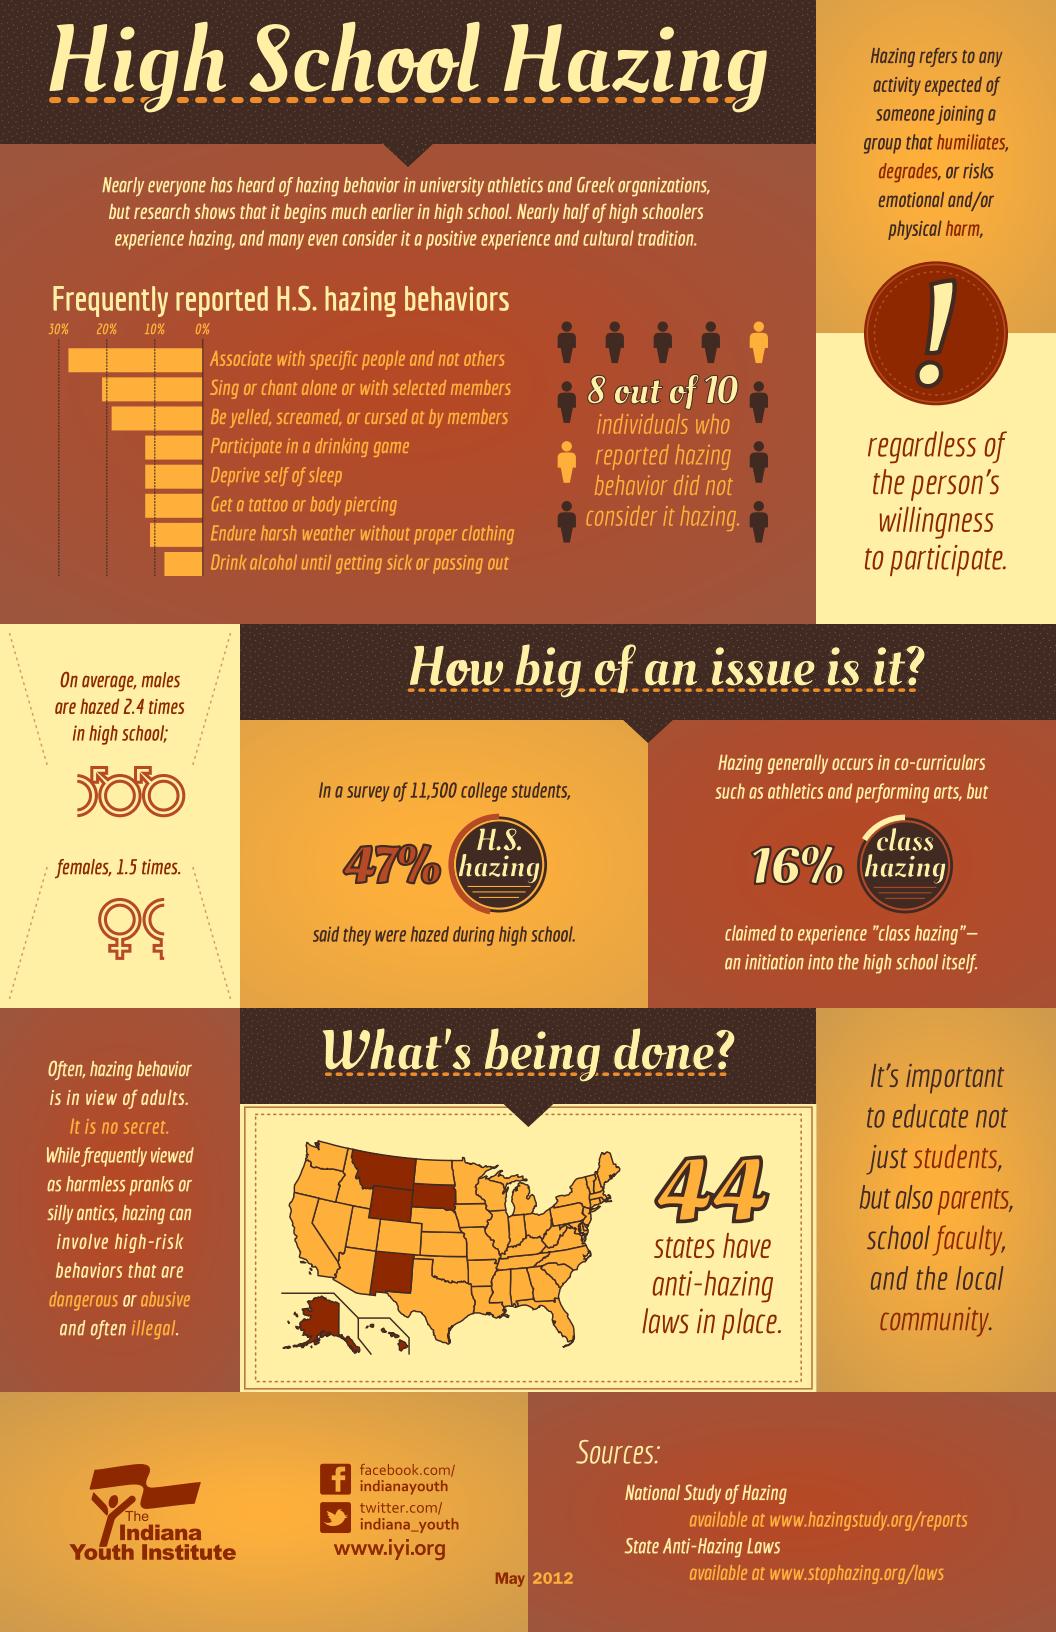 High School Hazing [INFOGRAPHIC] – Infographic List